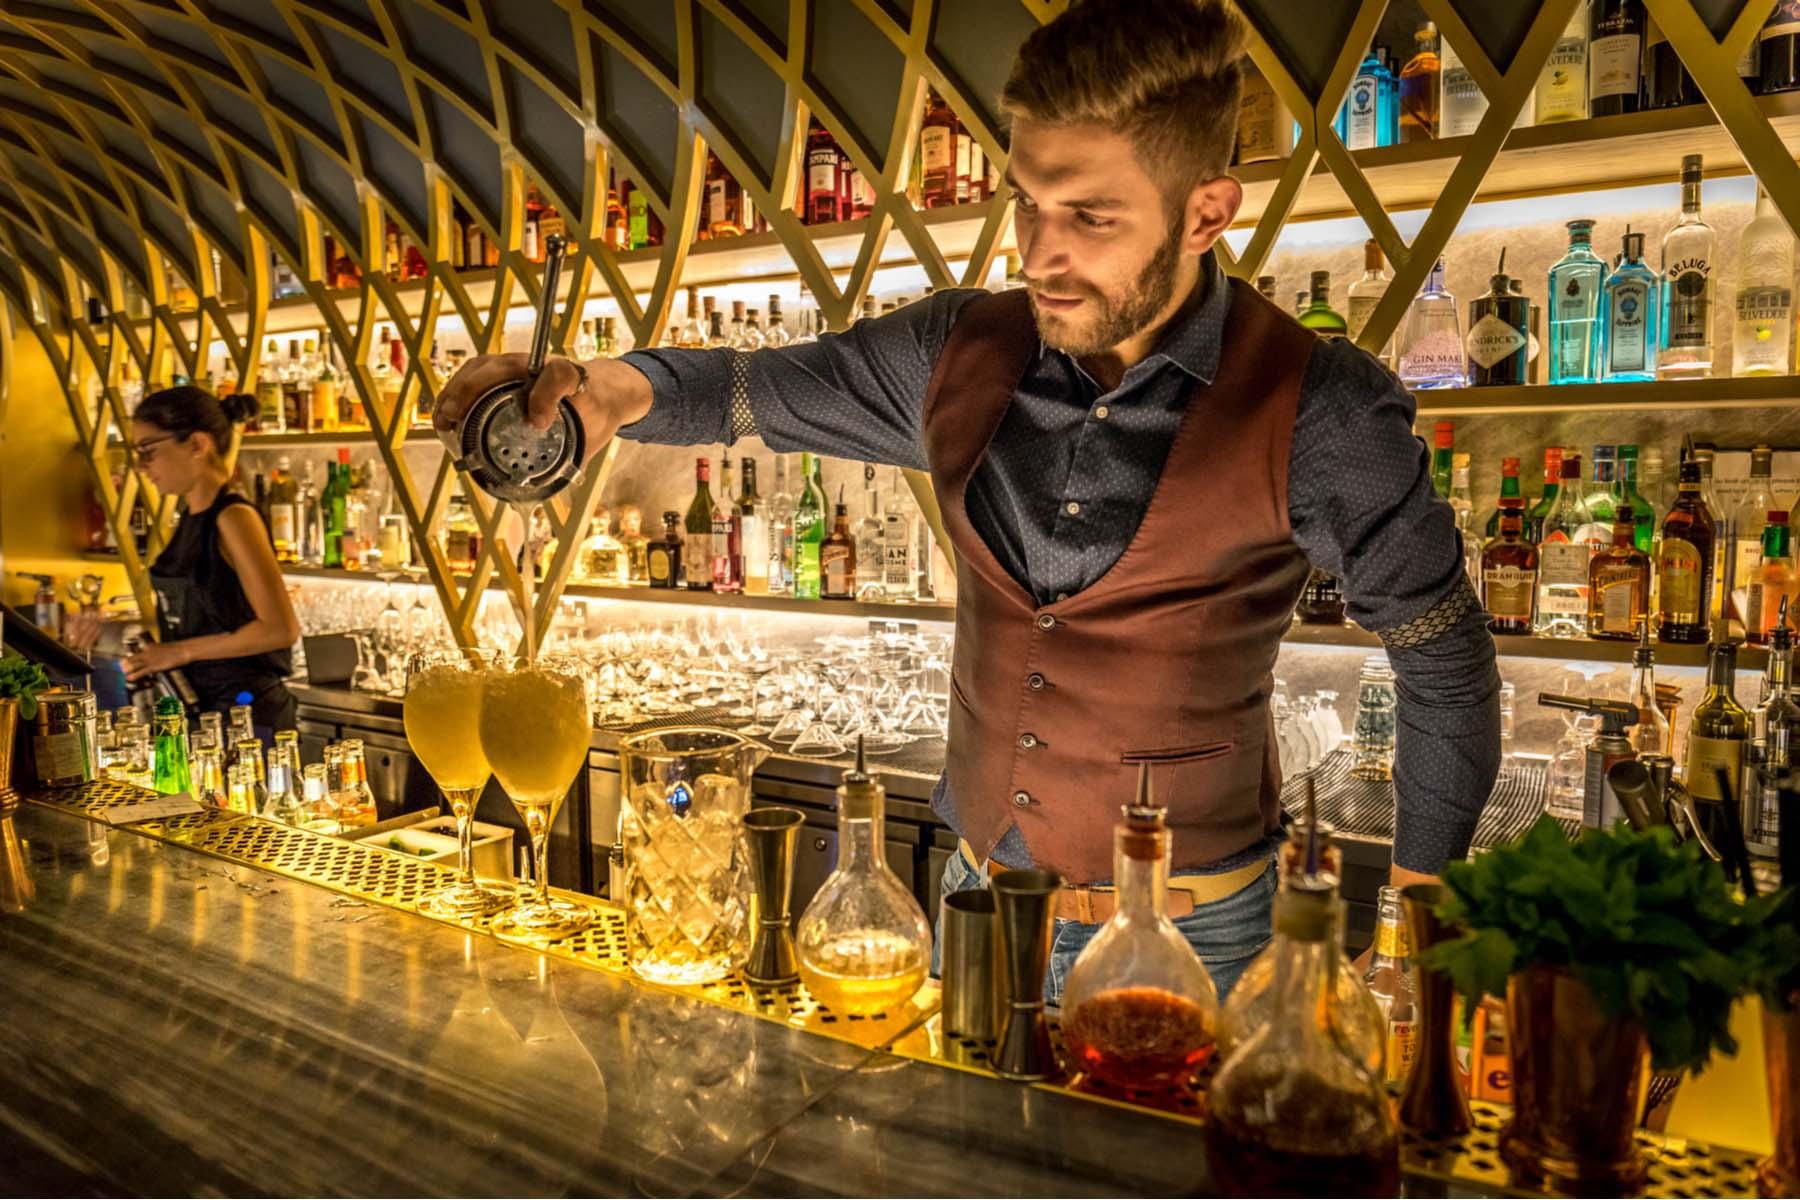 Bartender in the UK